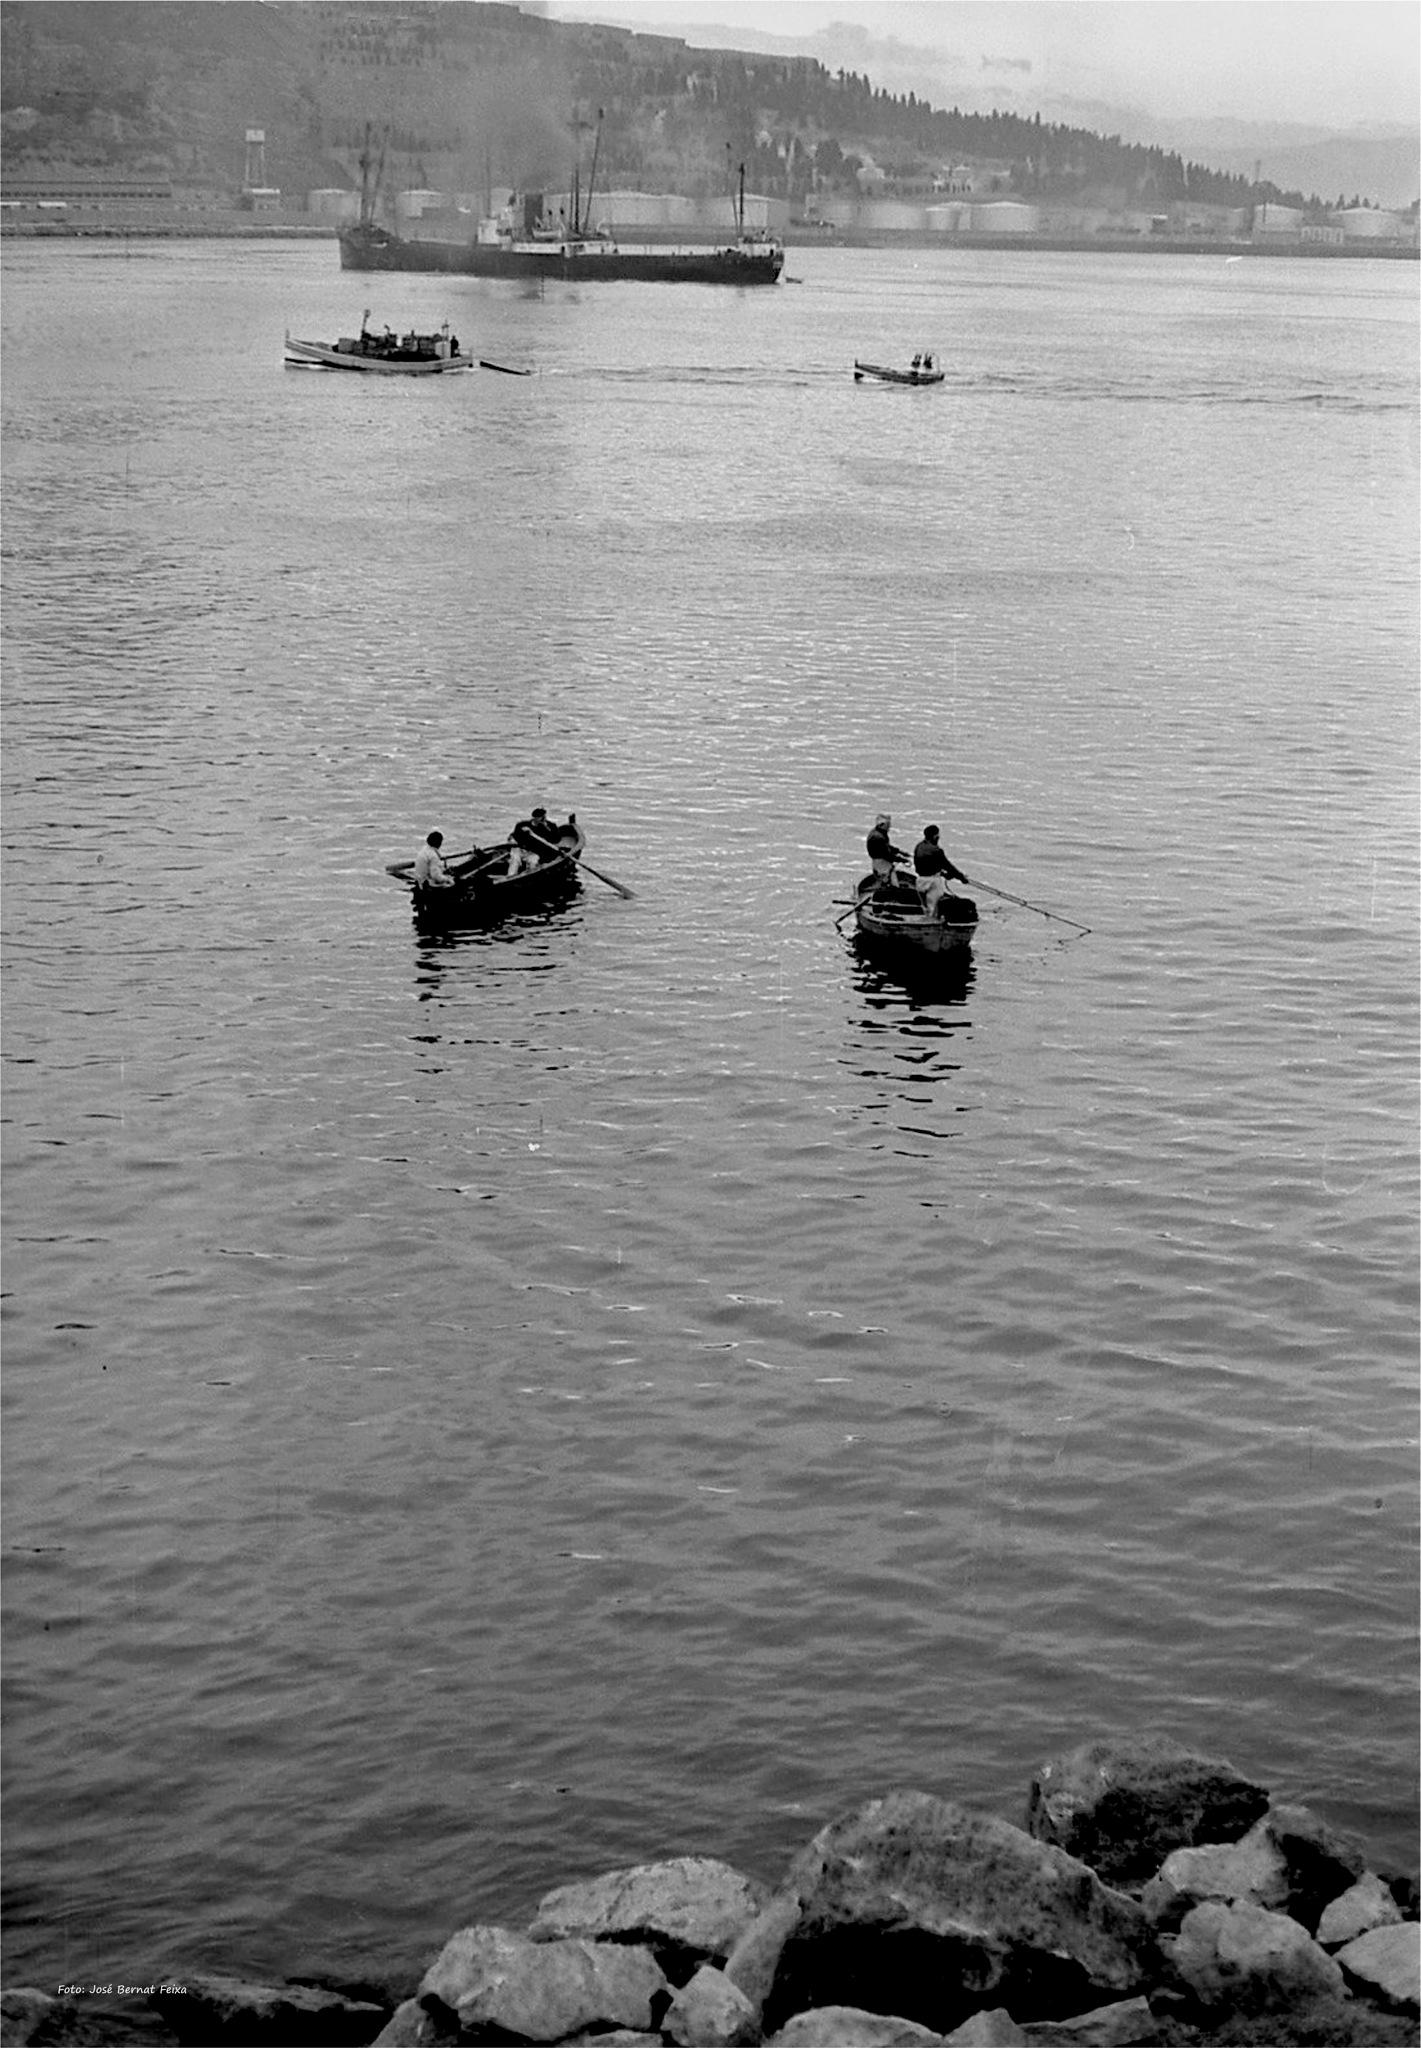 BARCAS DE PESCA Y BUQUE ; VISSERSBOTEN EN SCHIP ; FISHING BOATS AND SHIP (60's)  by José Bernat Feixa